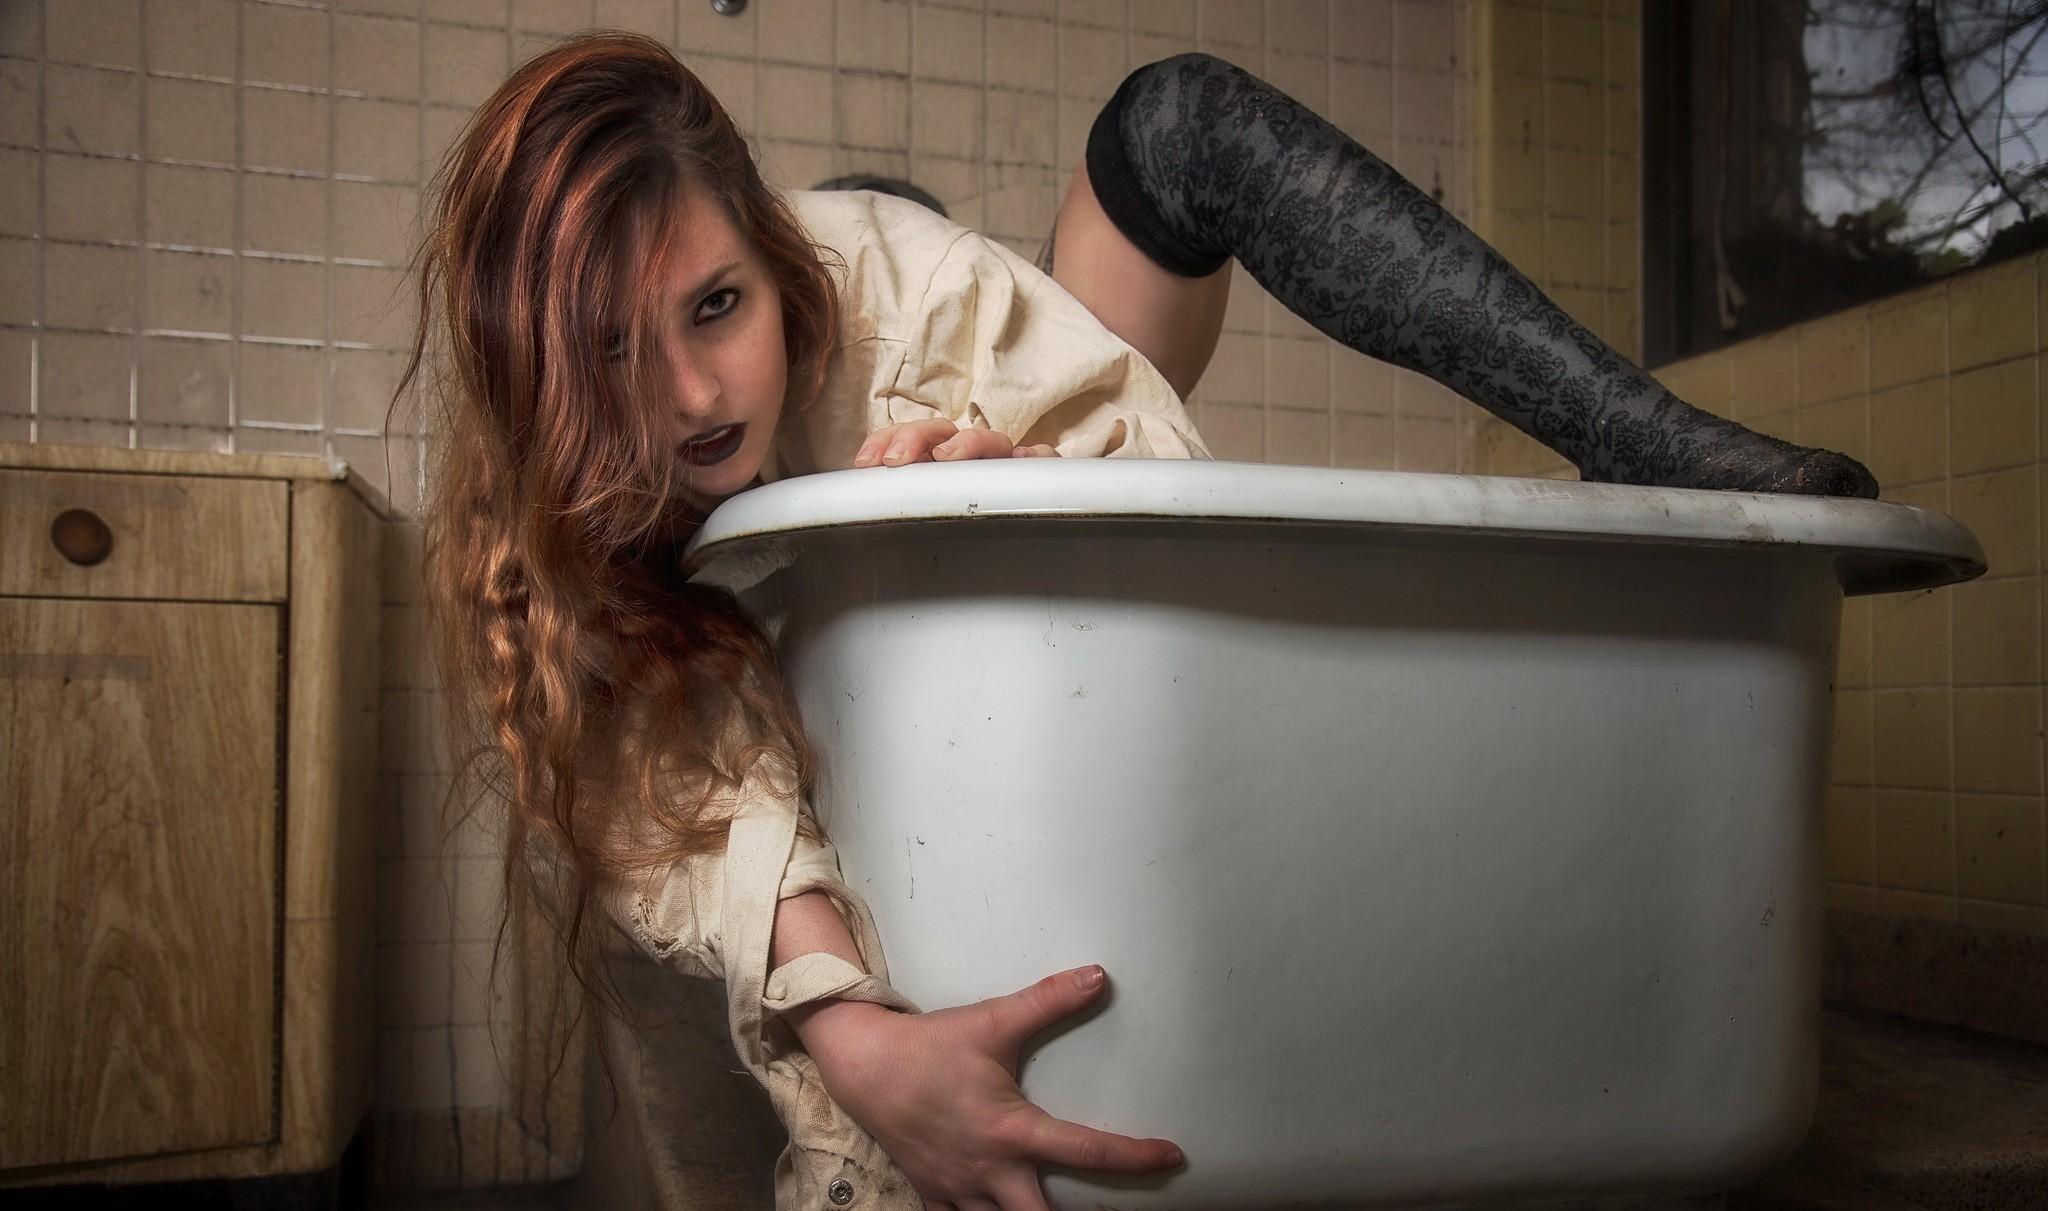 People 2048x1211 women model redhead thigh-highs hair in face women indoors bathtub eyeliner